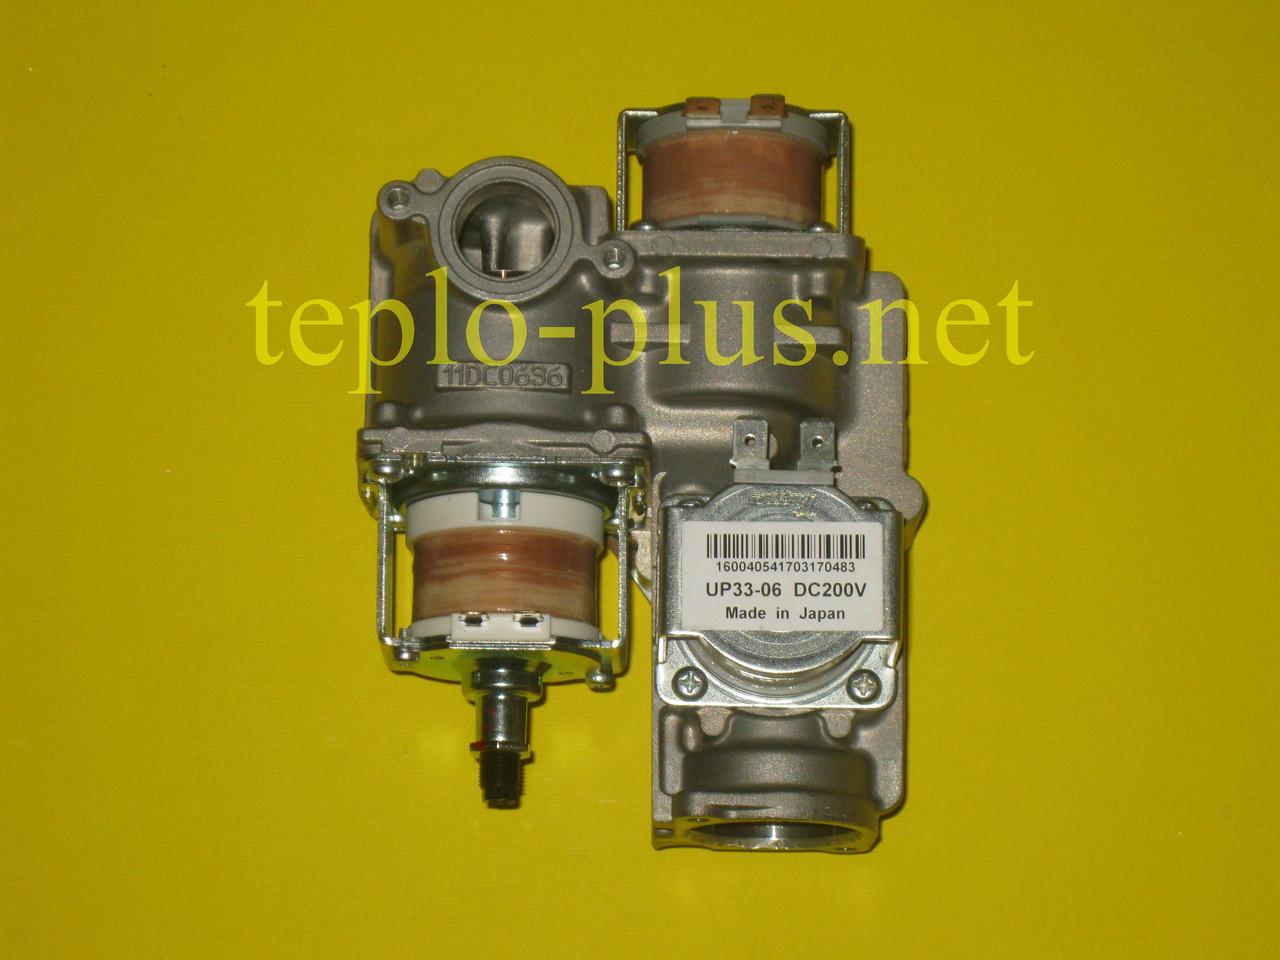 Газовый клапан (арматура газовая) в сборе BH0901004A Navien Ace ATMO 13-24kw, TURBO 13-40kw, TURBO Coaxial